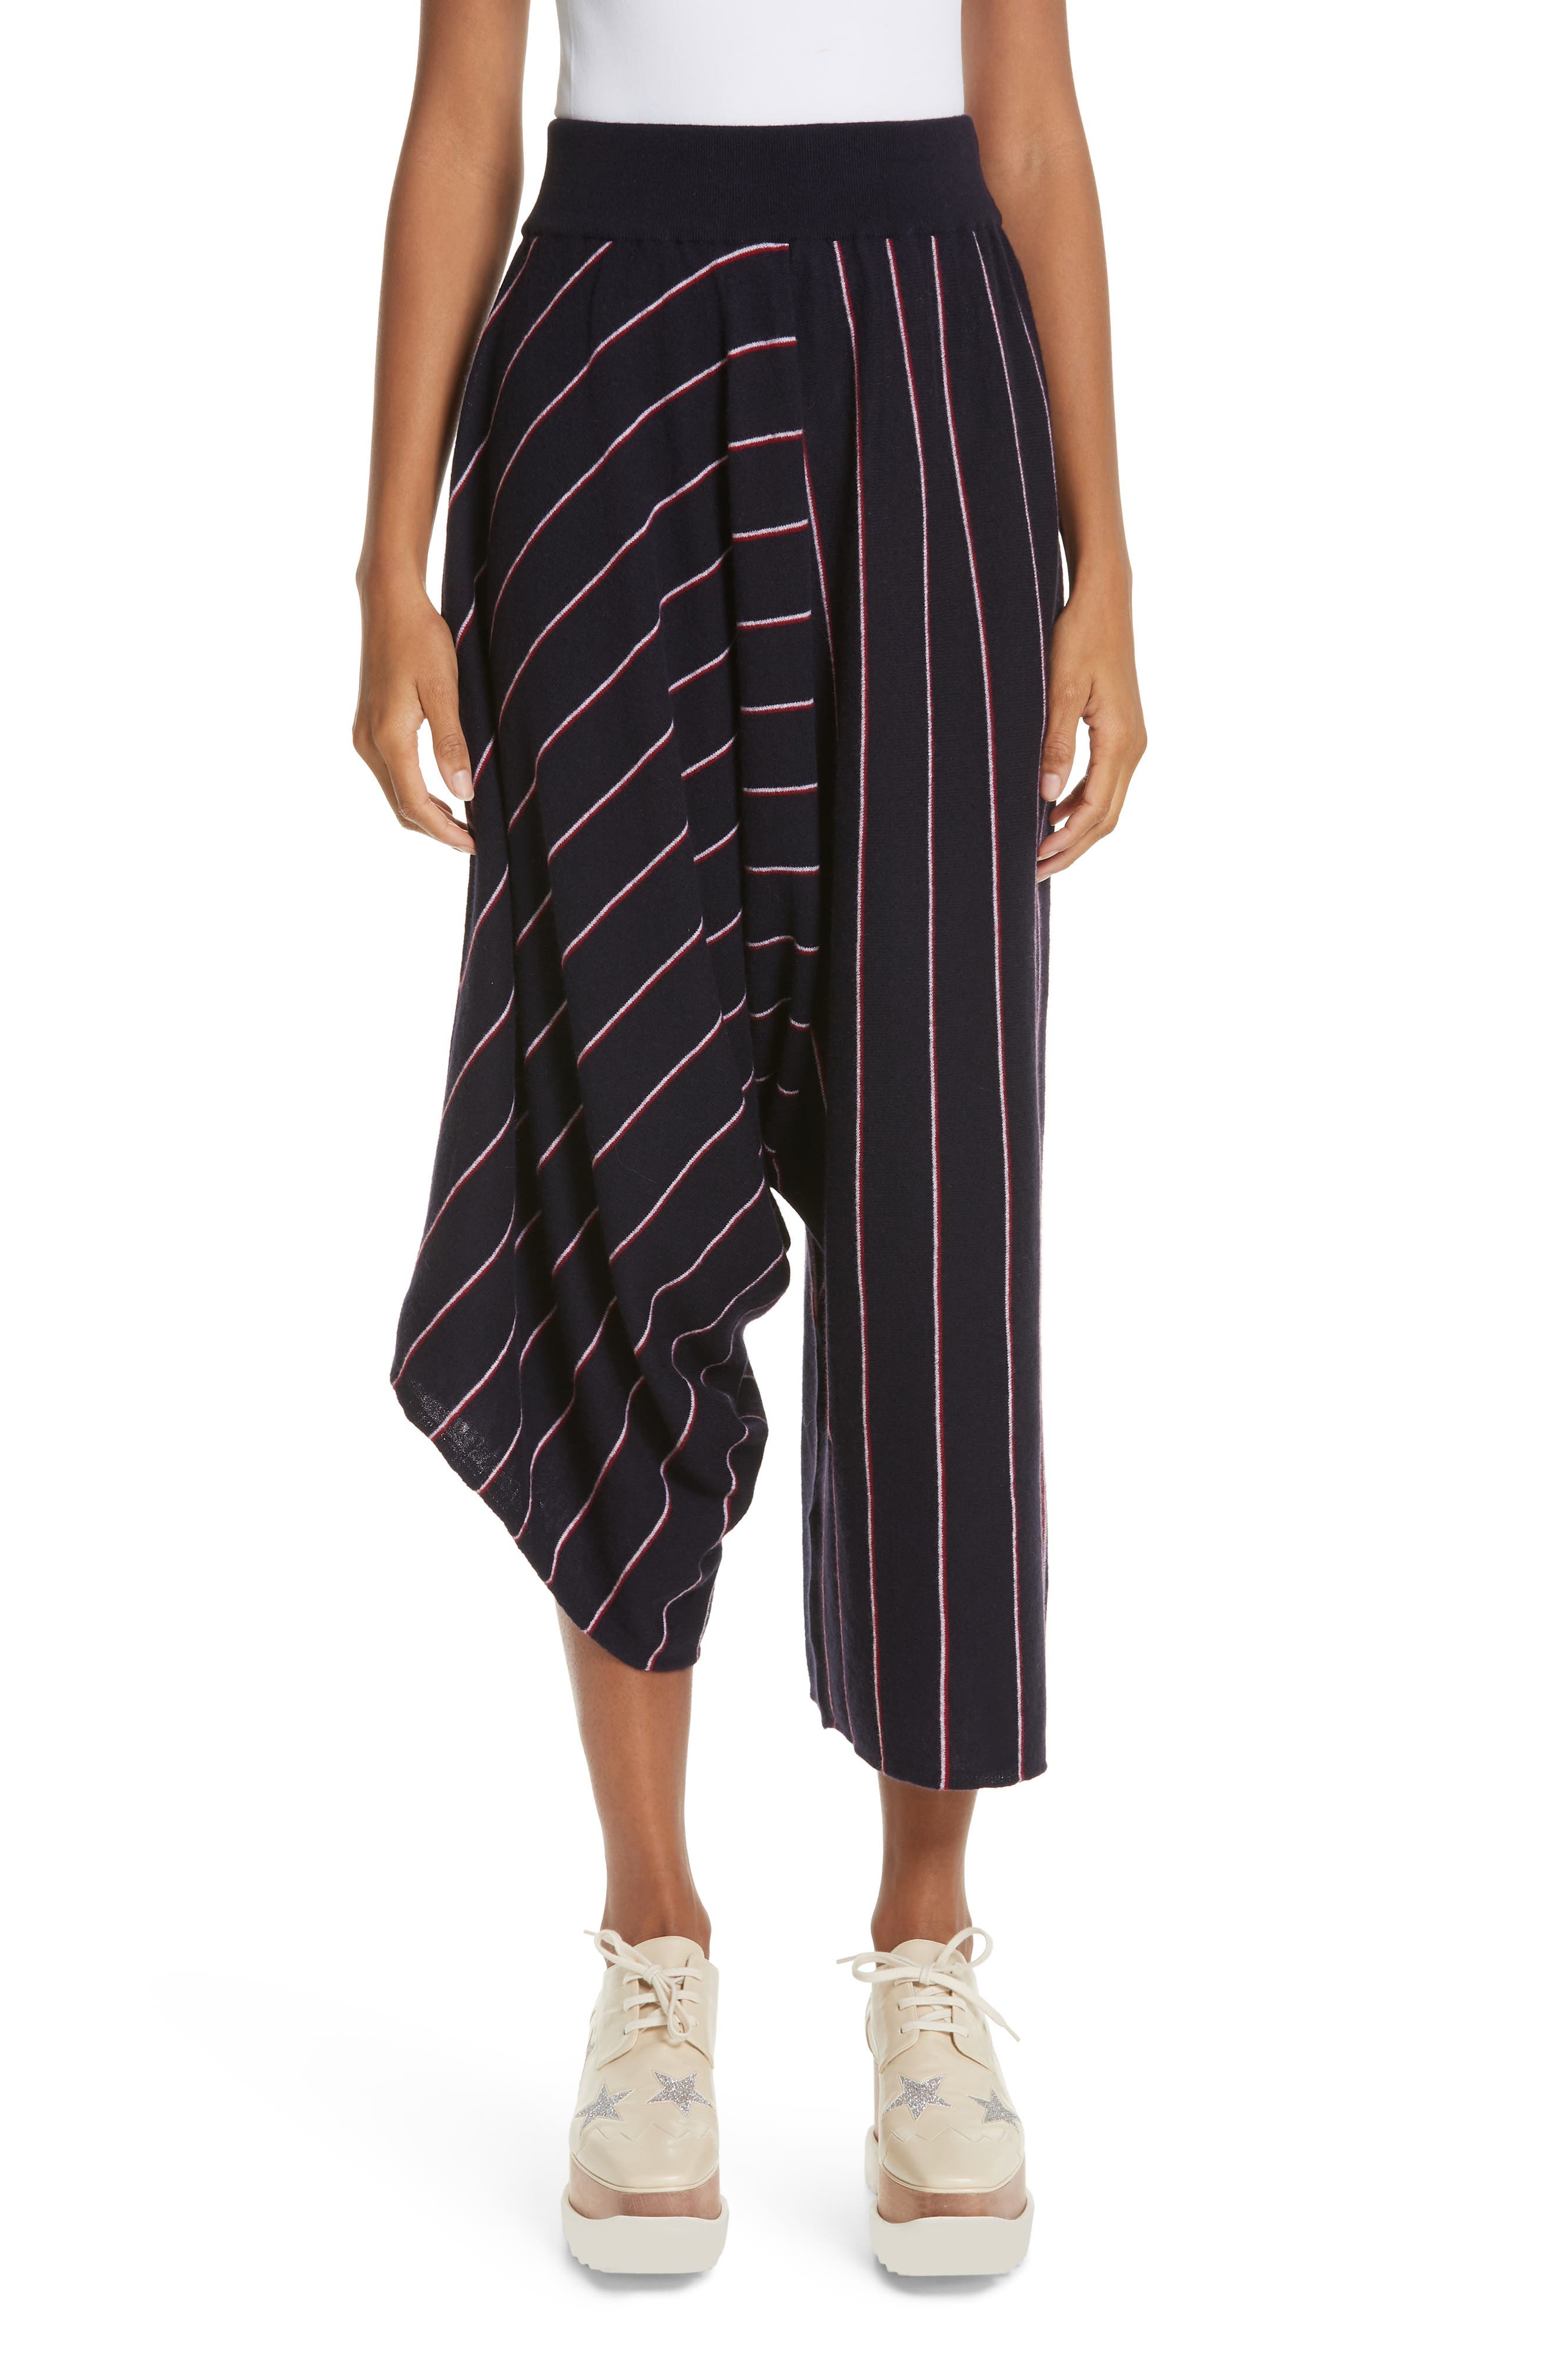 STELLA MCCARTNEY, Stripe Wool Knit Crop Pants, Main thumbnail 1, color, INK